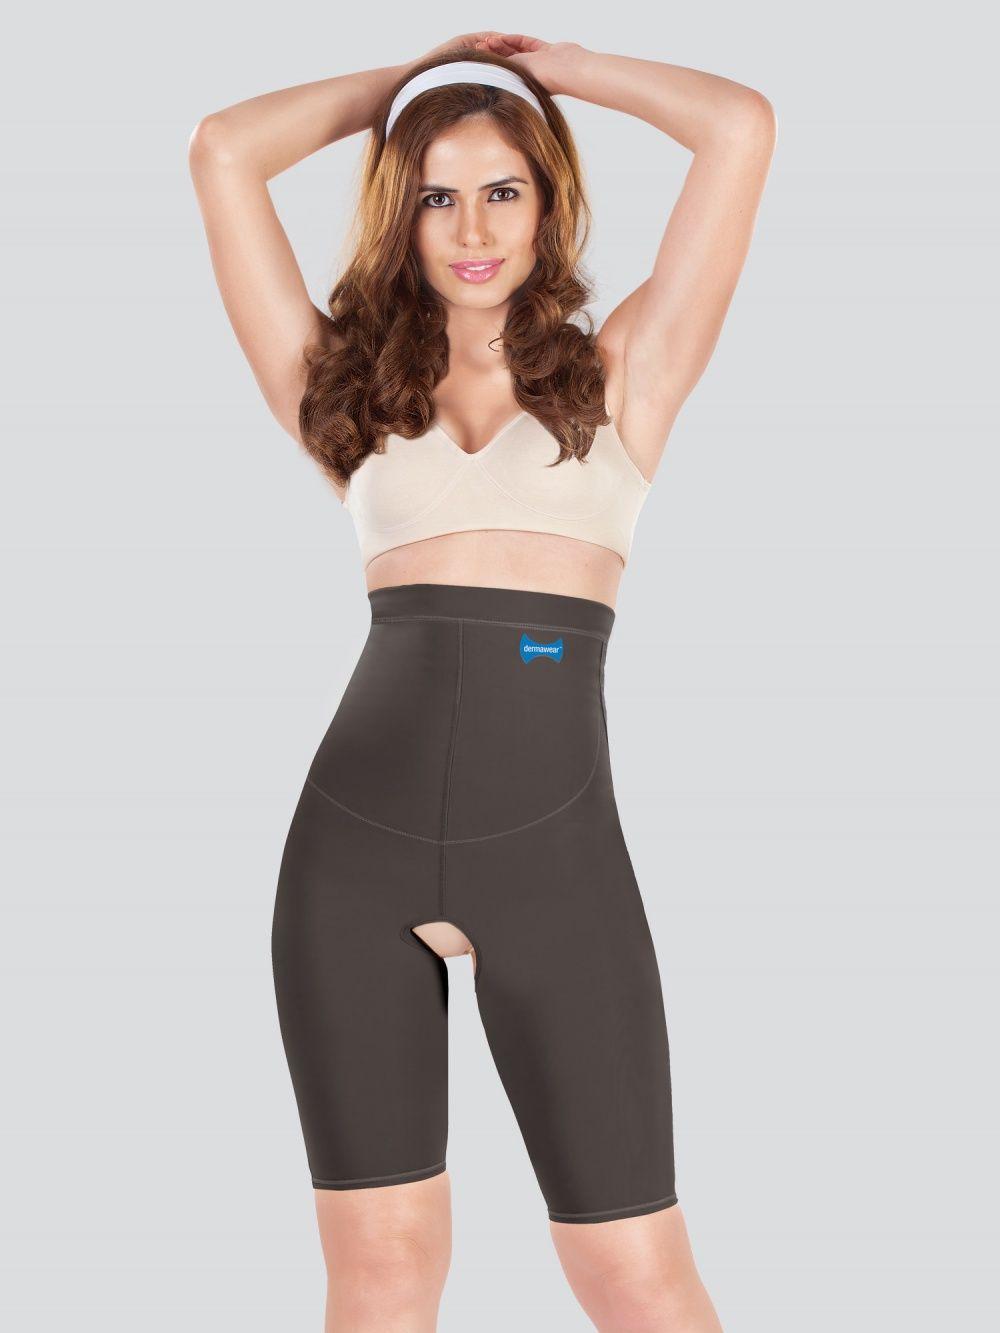 c62342d1b08 Dermawear Tummy   Waist Cinchers   Buy Dermawear Hip Corset - Black ...